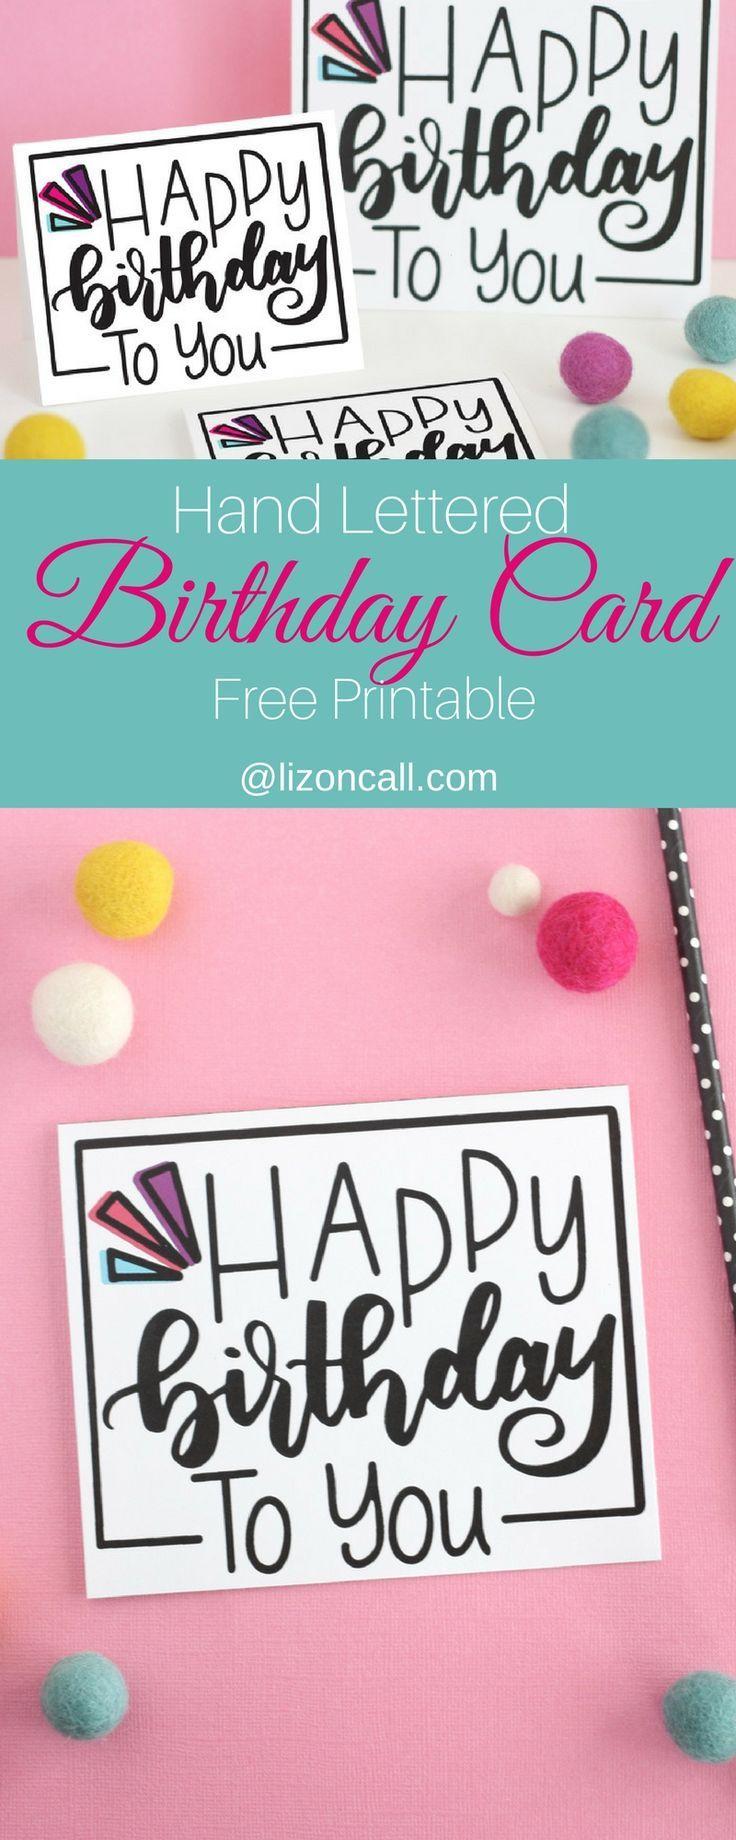 Hand Lettered Free Printable Birthday Card Celebrating Birthdays